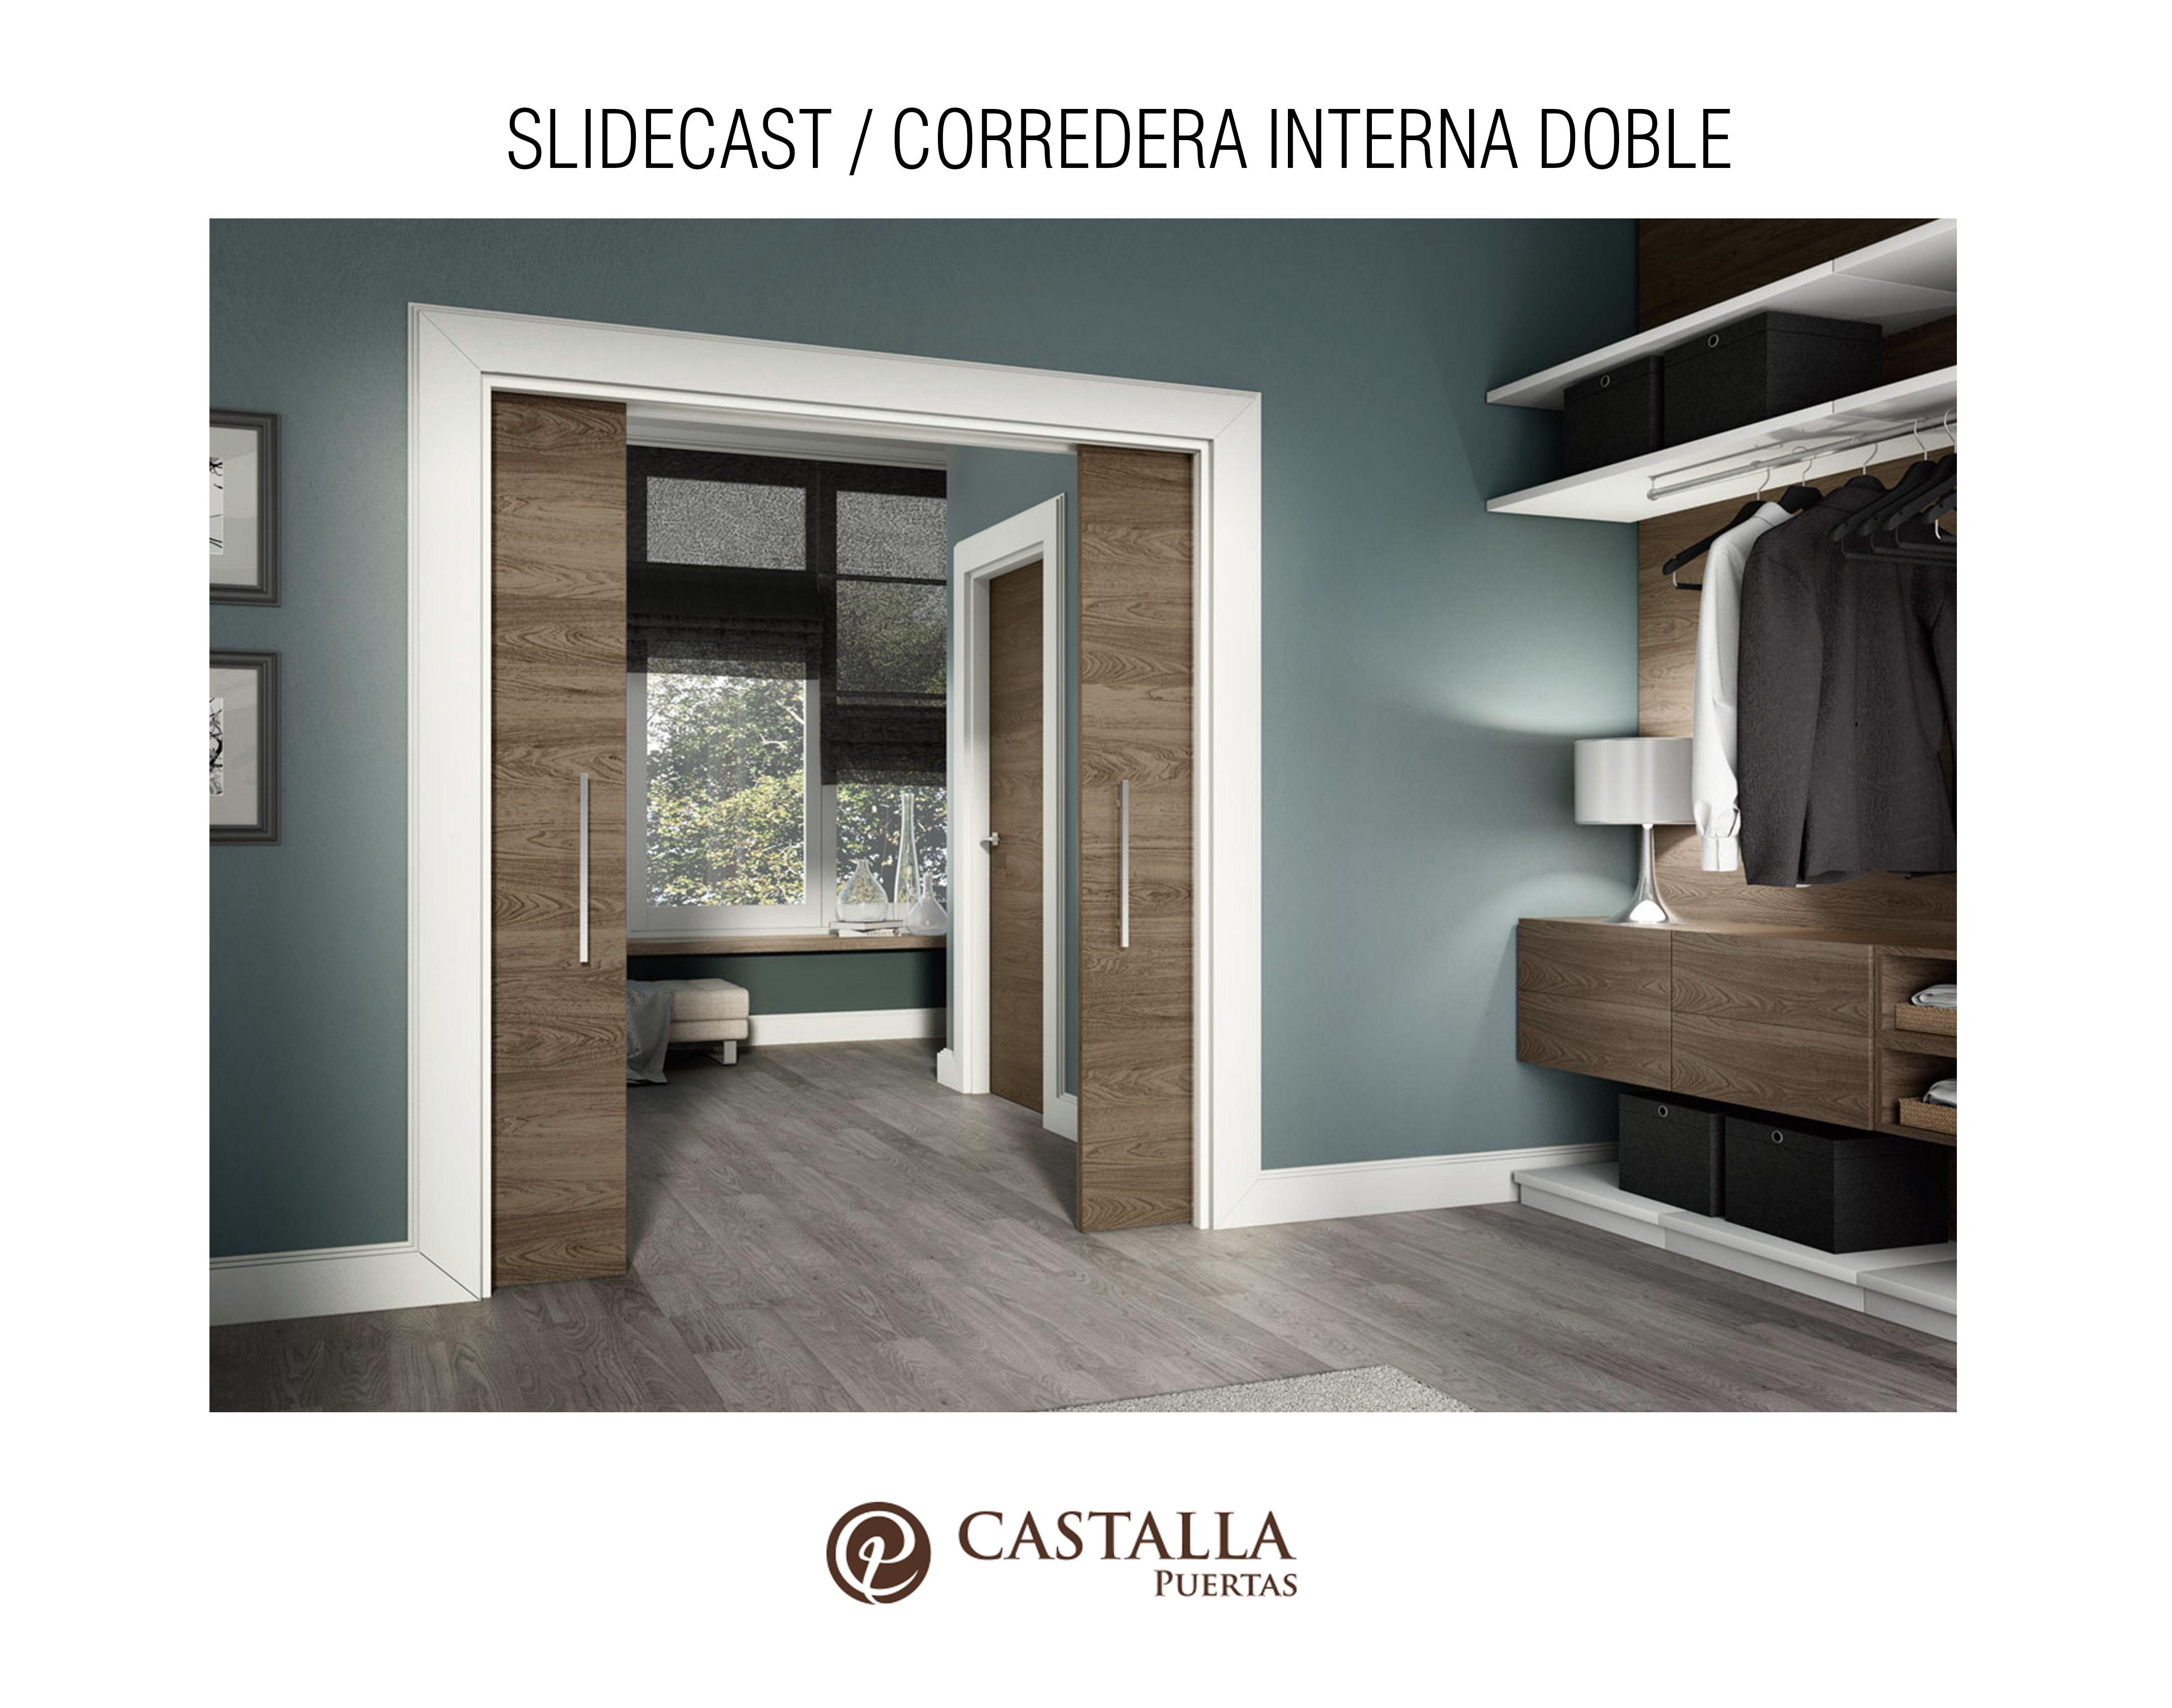 Puerta Corredera Interior Sistema Slidecast Puertas Correderas  ~ Puertas Correderas Interior Rusticas